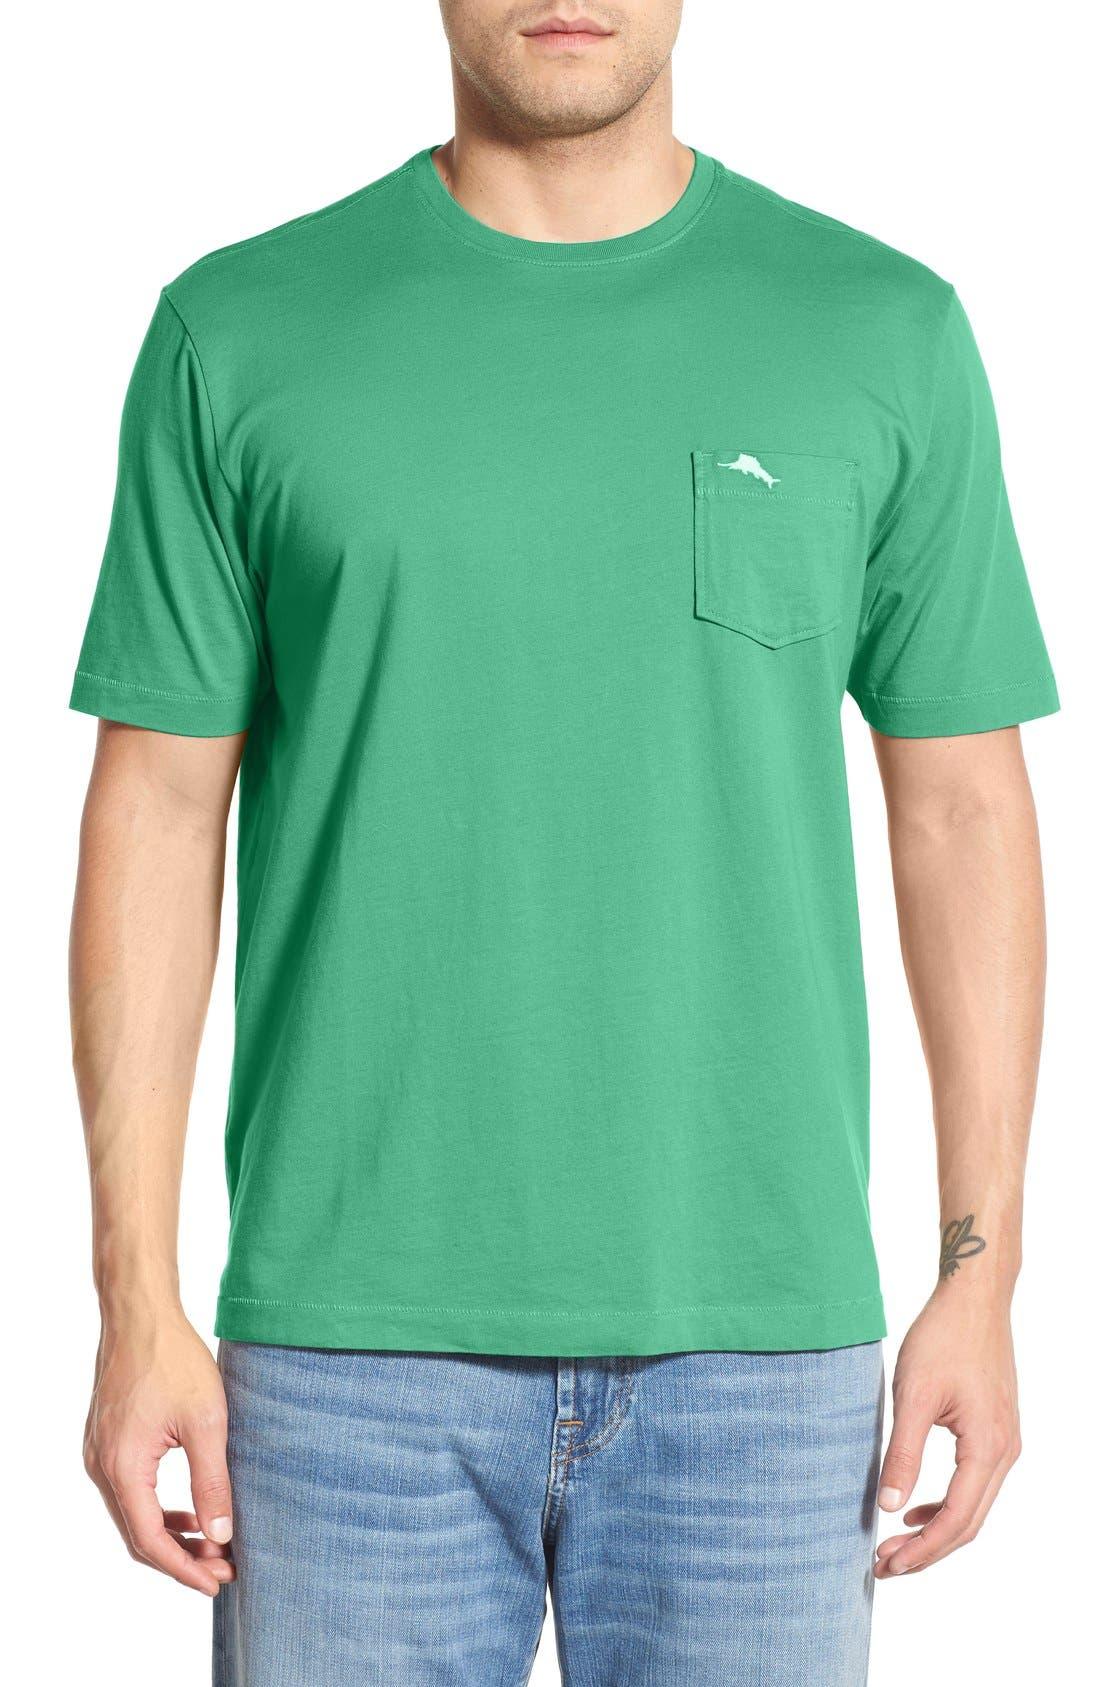 New Bali Sky Pima Cotton Pocket T-Shirt,                             Main thumbnail 1, color,                             Greens Fee